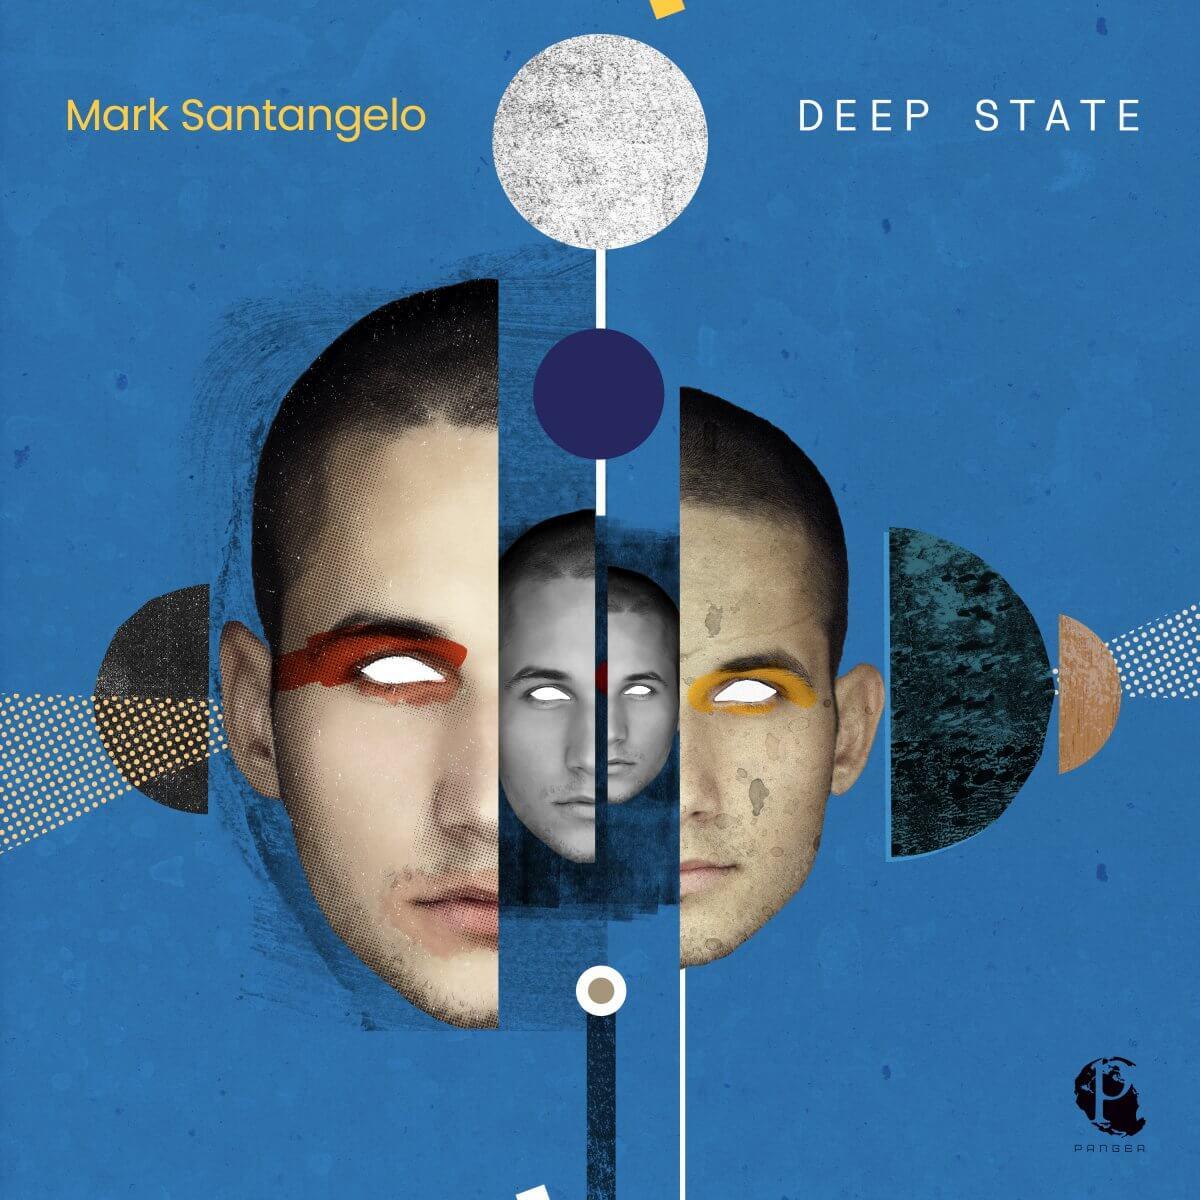 Mark Santangelo - Deep State for Pangea Records